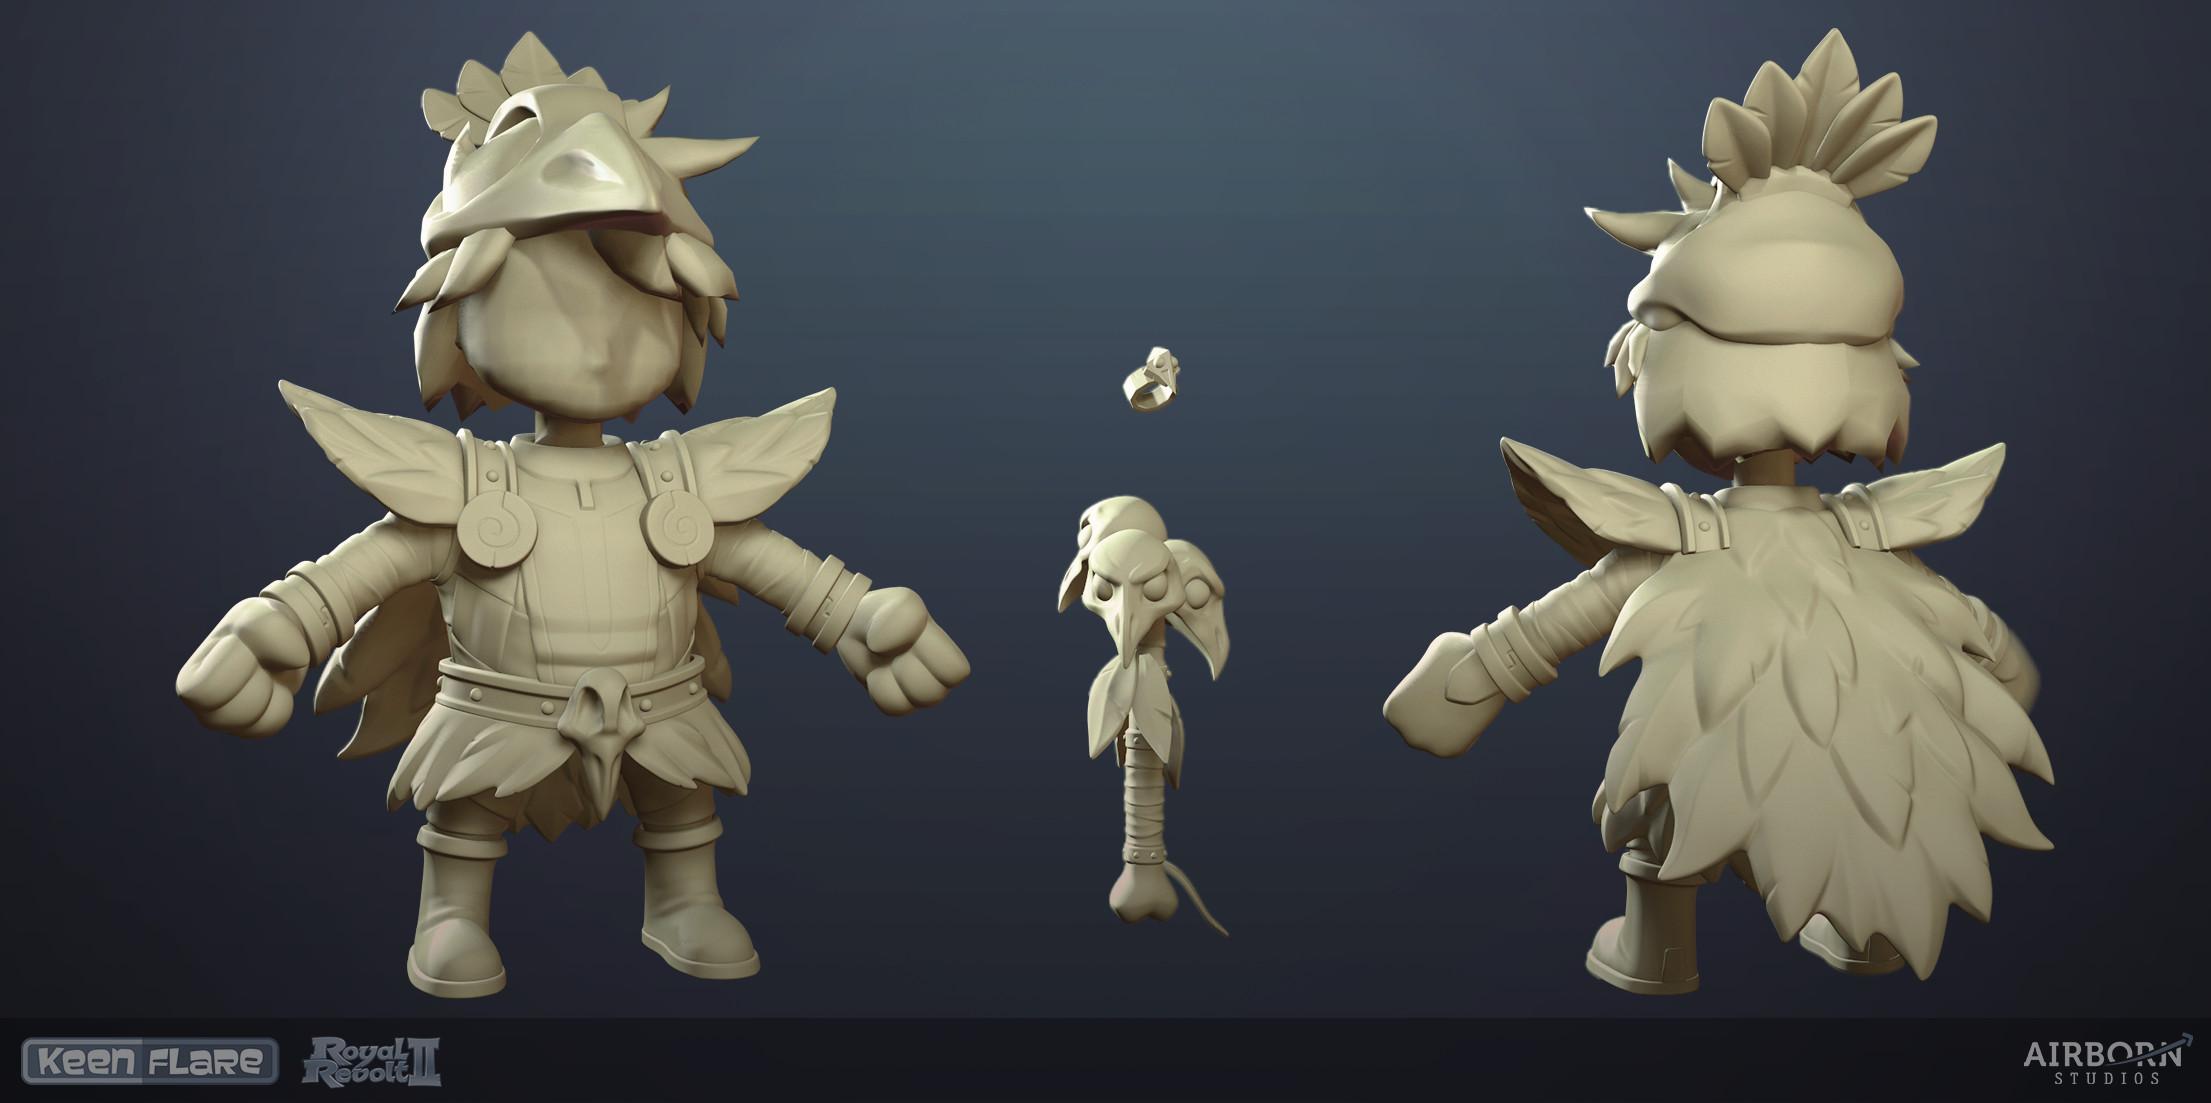 Royal Revolt 2: Necromancer Item Set high-poly model by Alexandra Graap